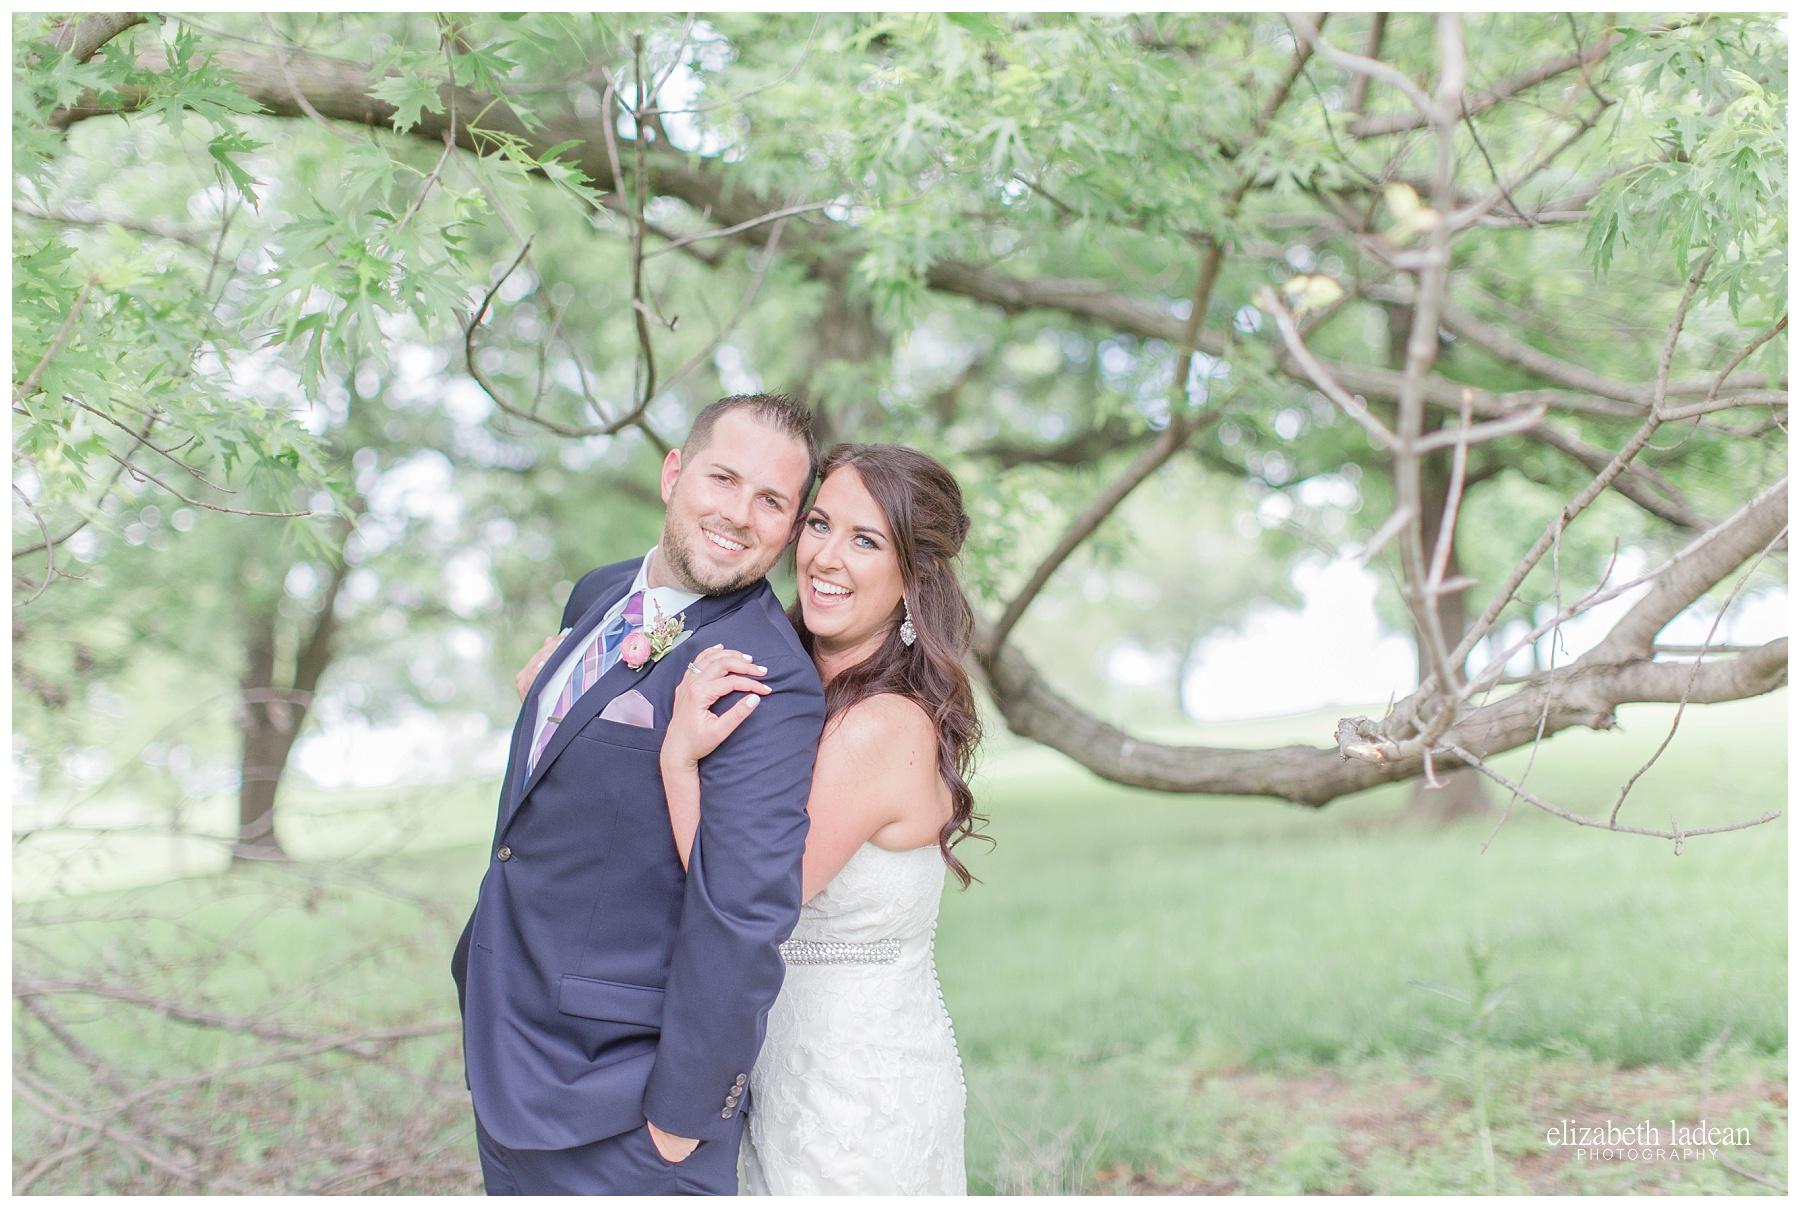 Hillcrest-Country-Club-Kansas-City-Wedding-Photography-E+J-0520-Elizabeth-Ladean-Photography-photo_0870.jpg